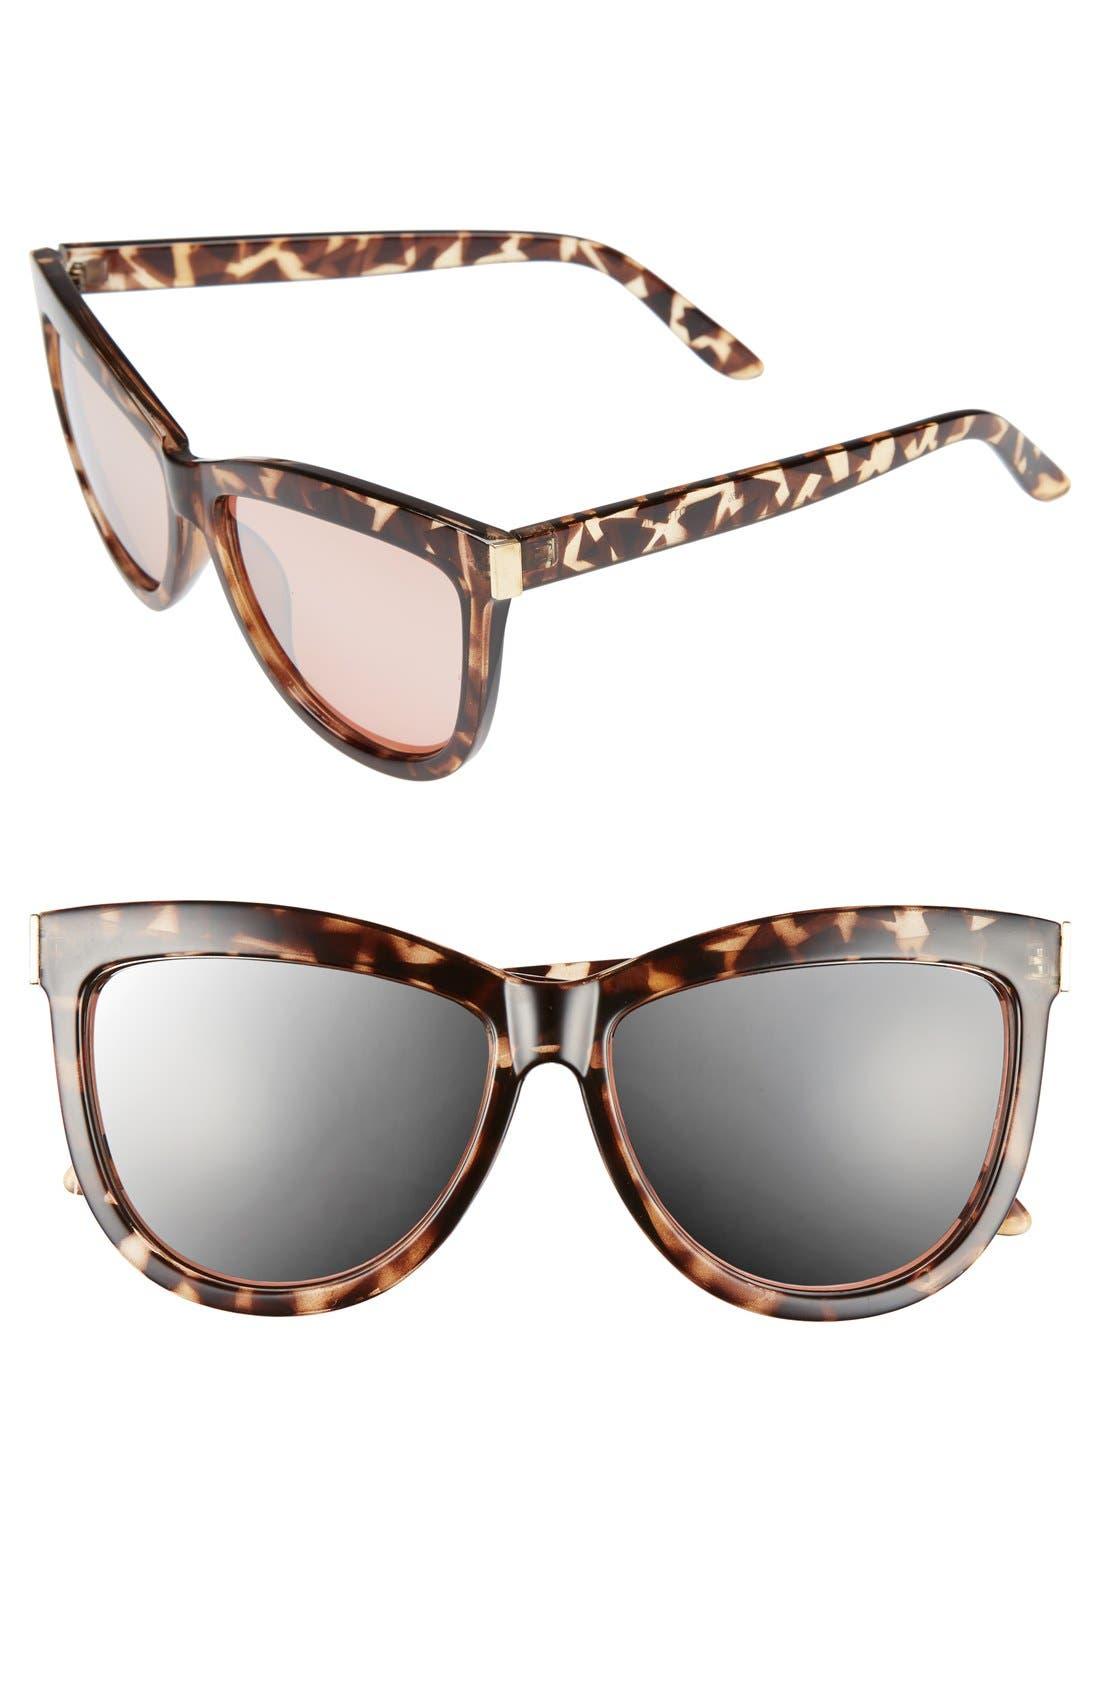 Main Image - BP. 58mm Mirror Cat Eye Sunglasses